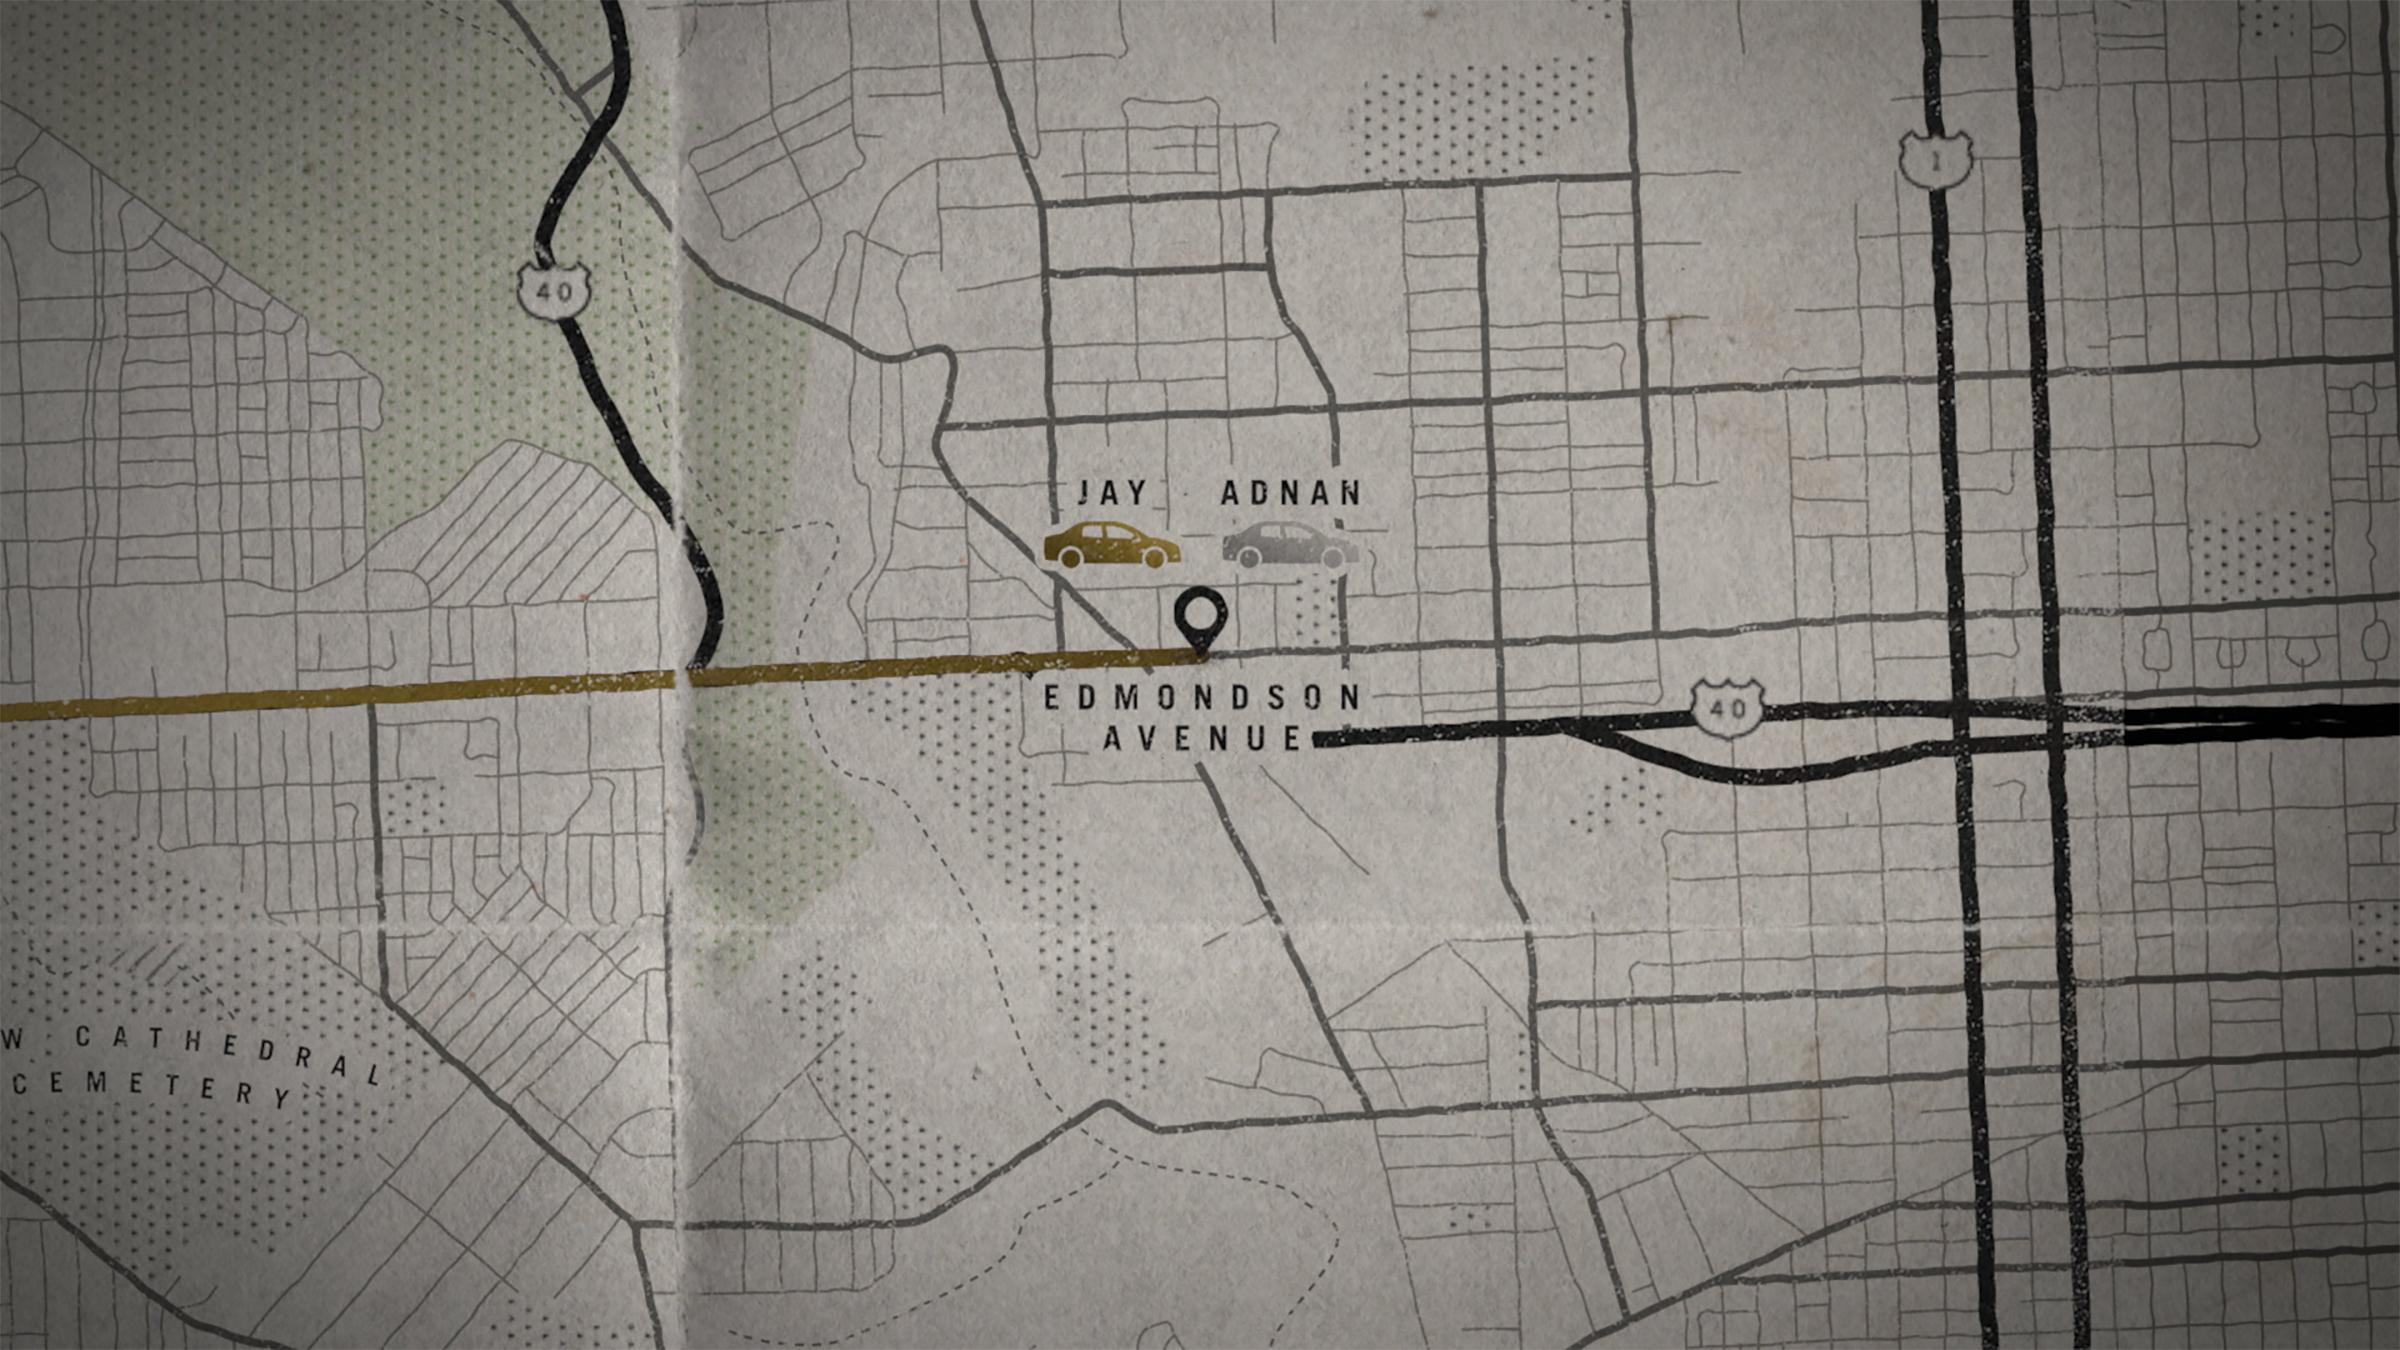 And-Or-Studio_CS_Adnan_09_map.jpg